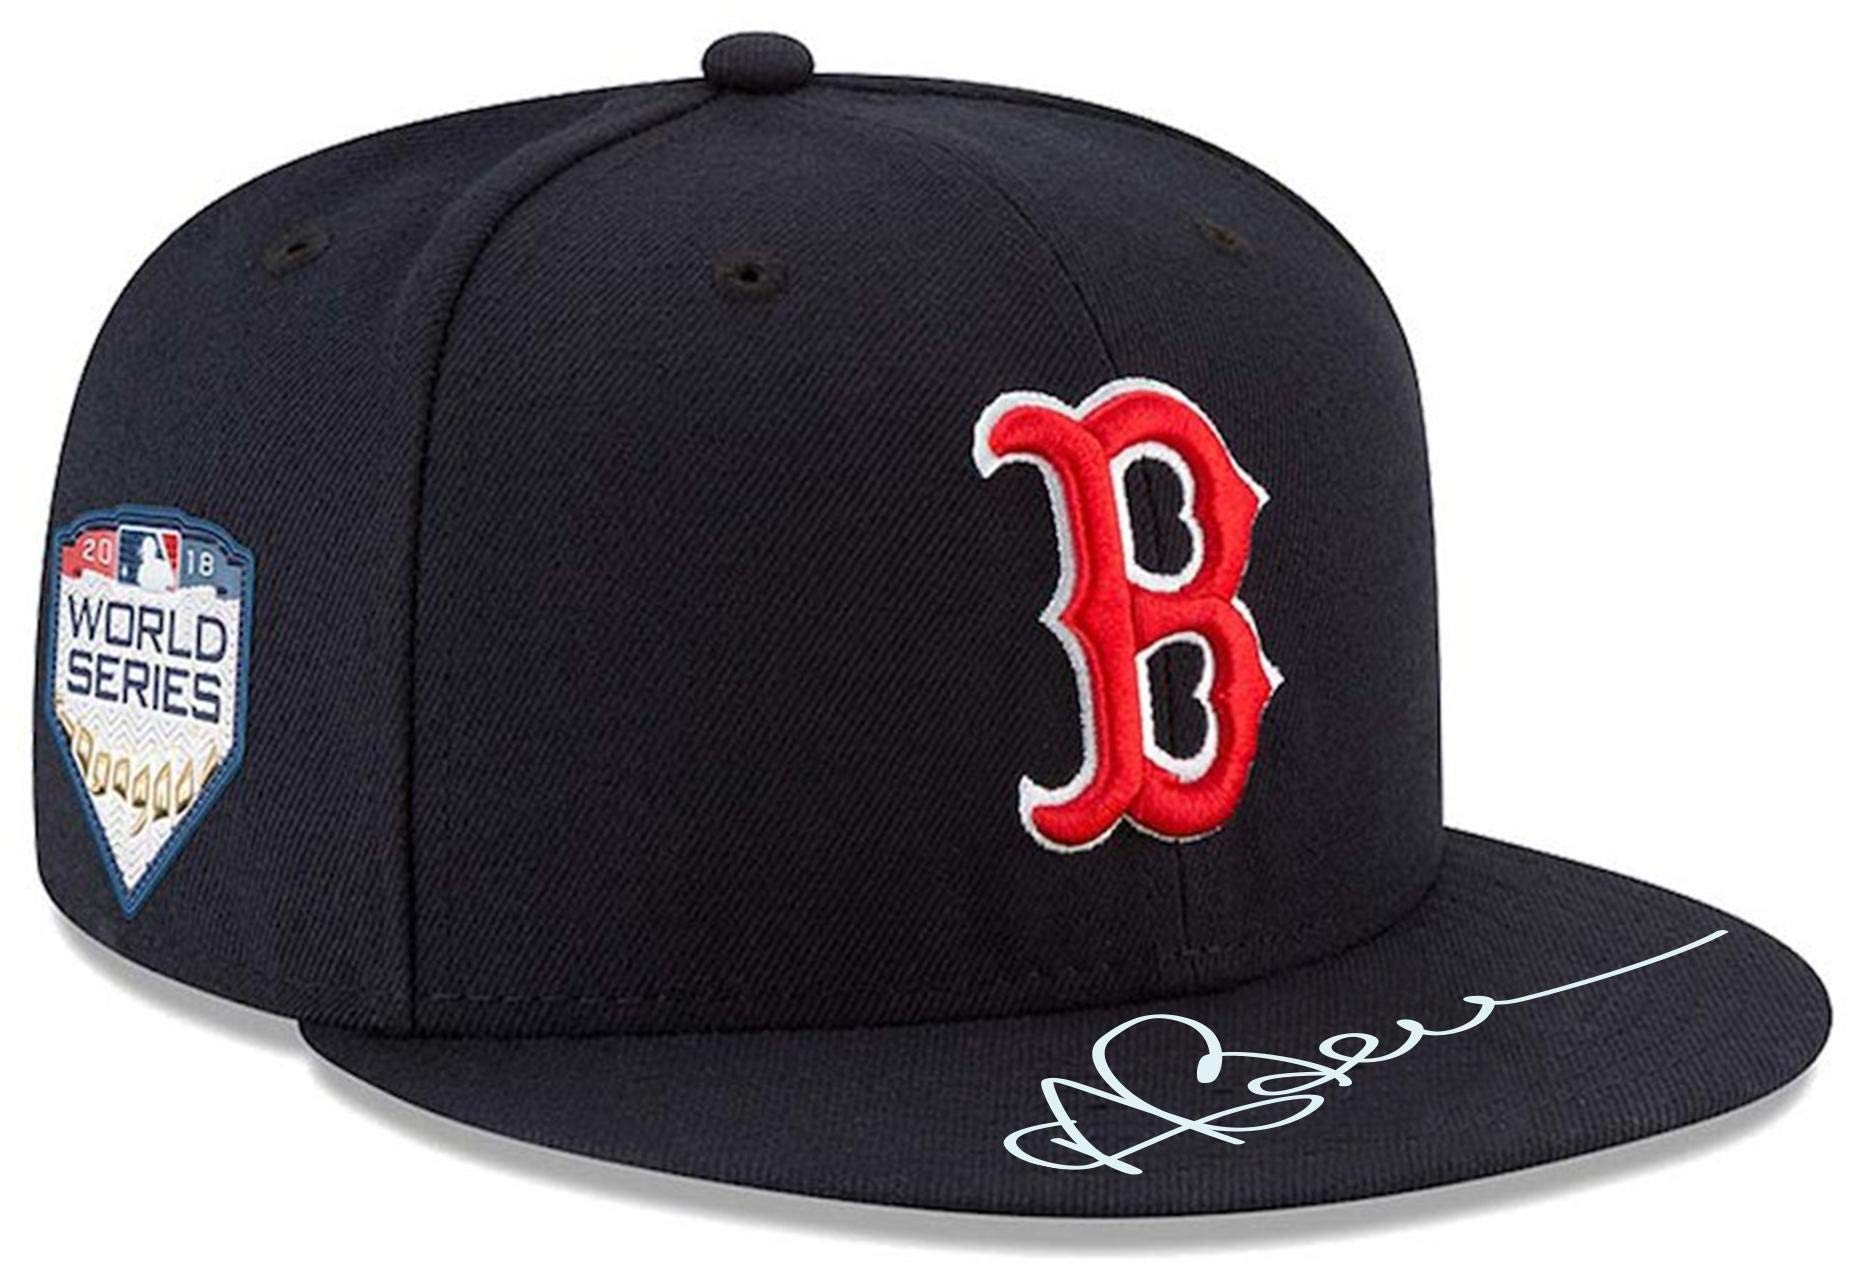 Andrew Benintendi Boston Red Sox 2018 MLB World Series Champions Autographed World Series Cap Fanatics Authentic Certified